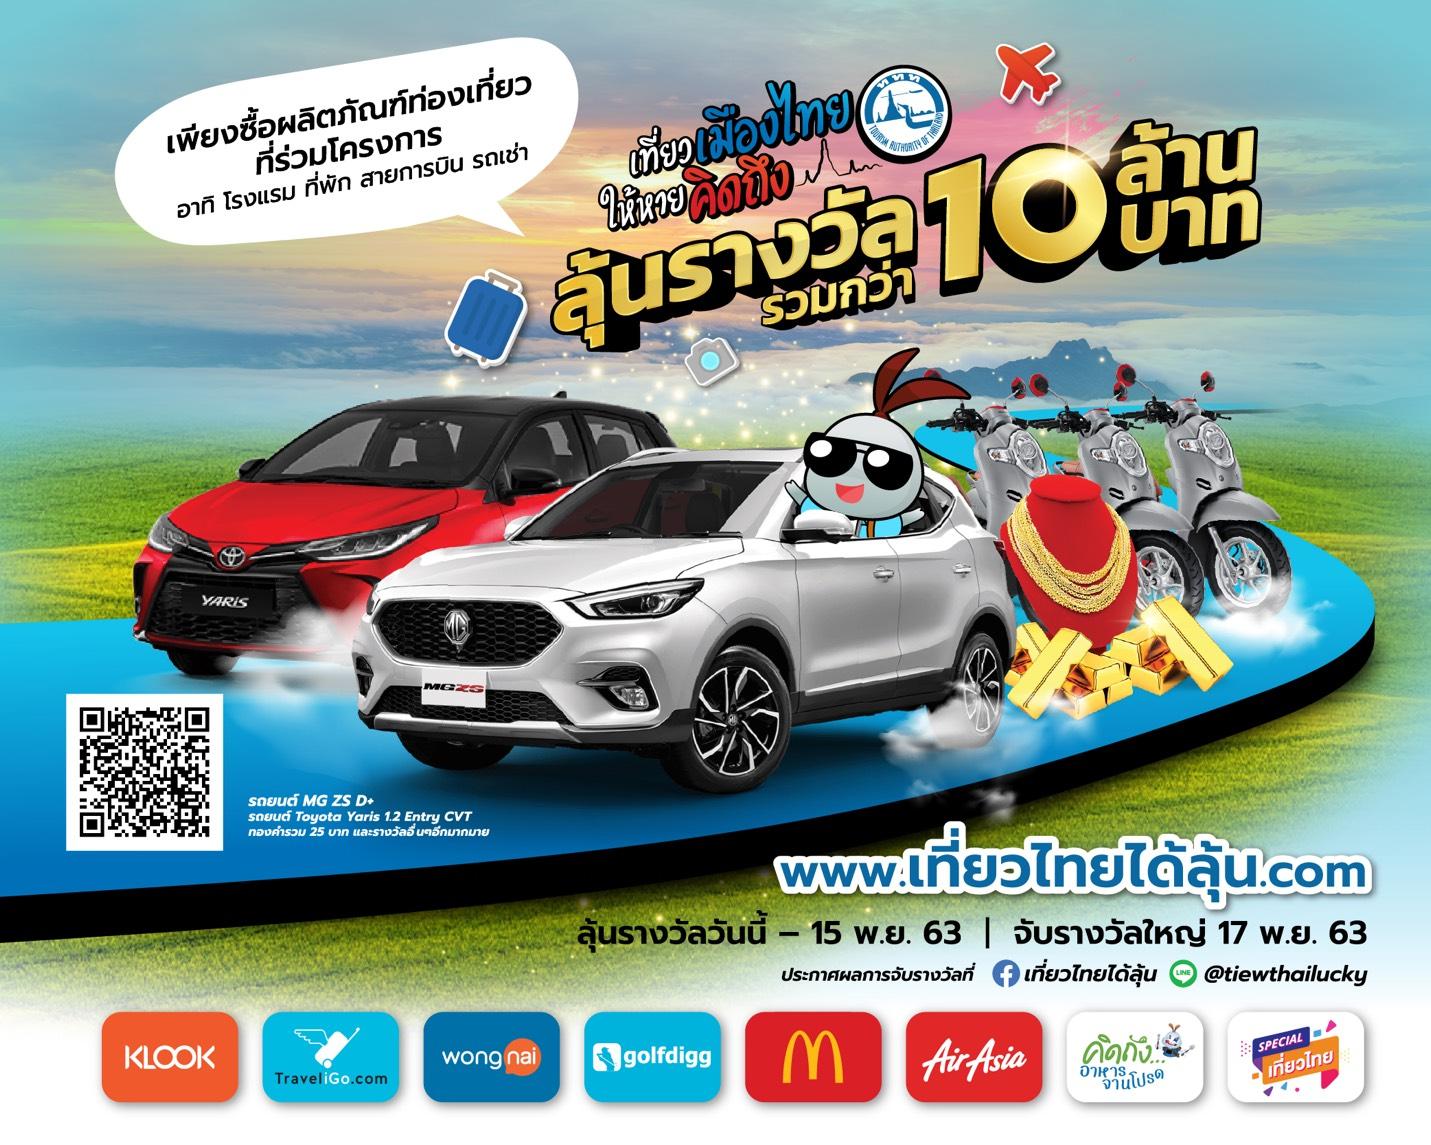 TAT tiewthailucky ททท เที่ยวเมืองไทย